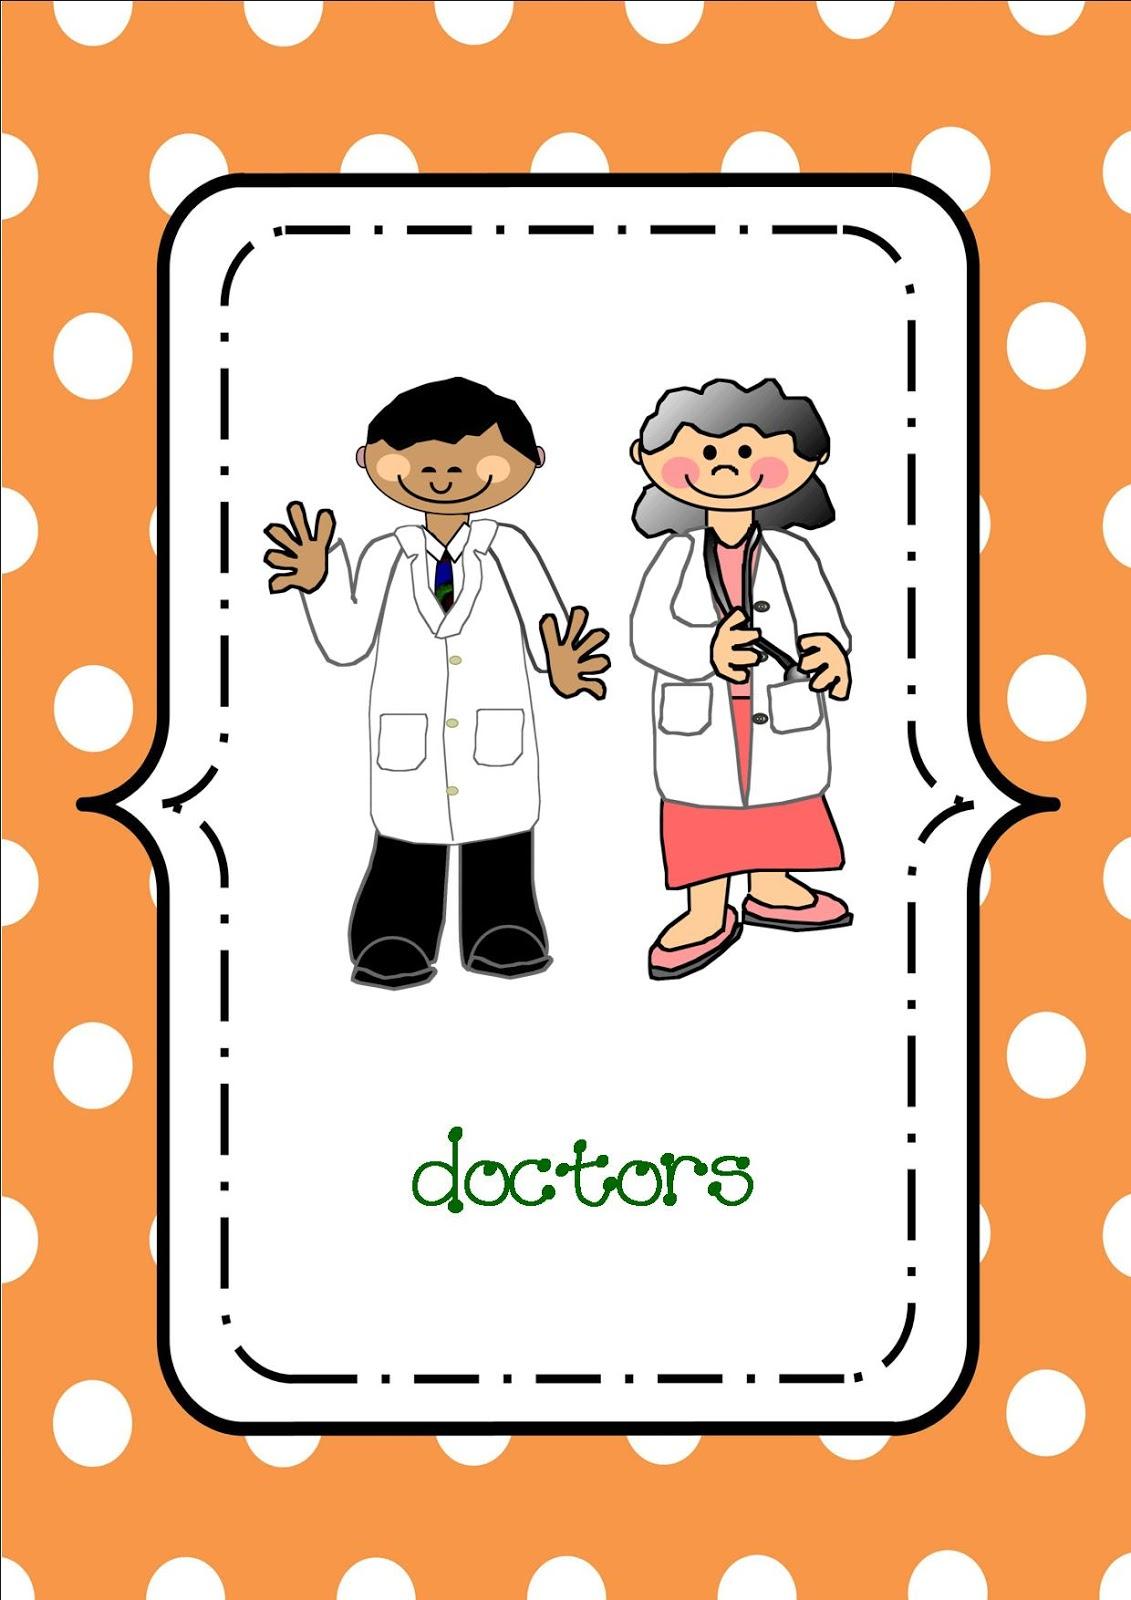 Community helpers doctor essay -